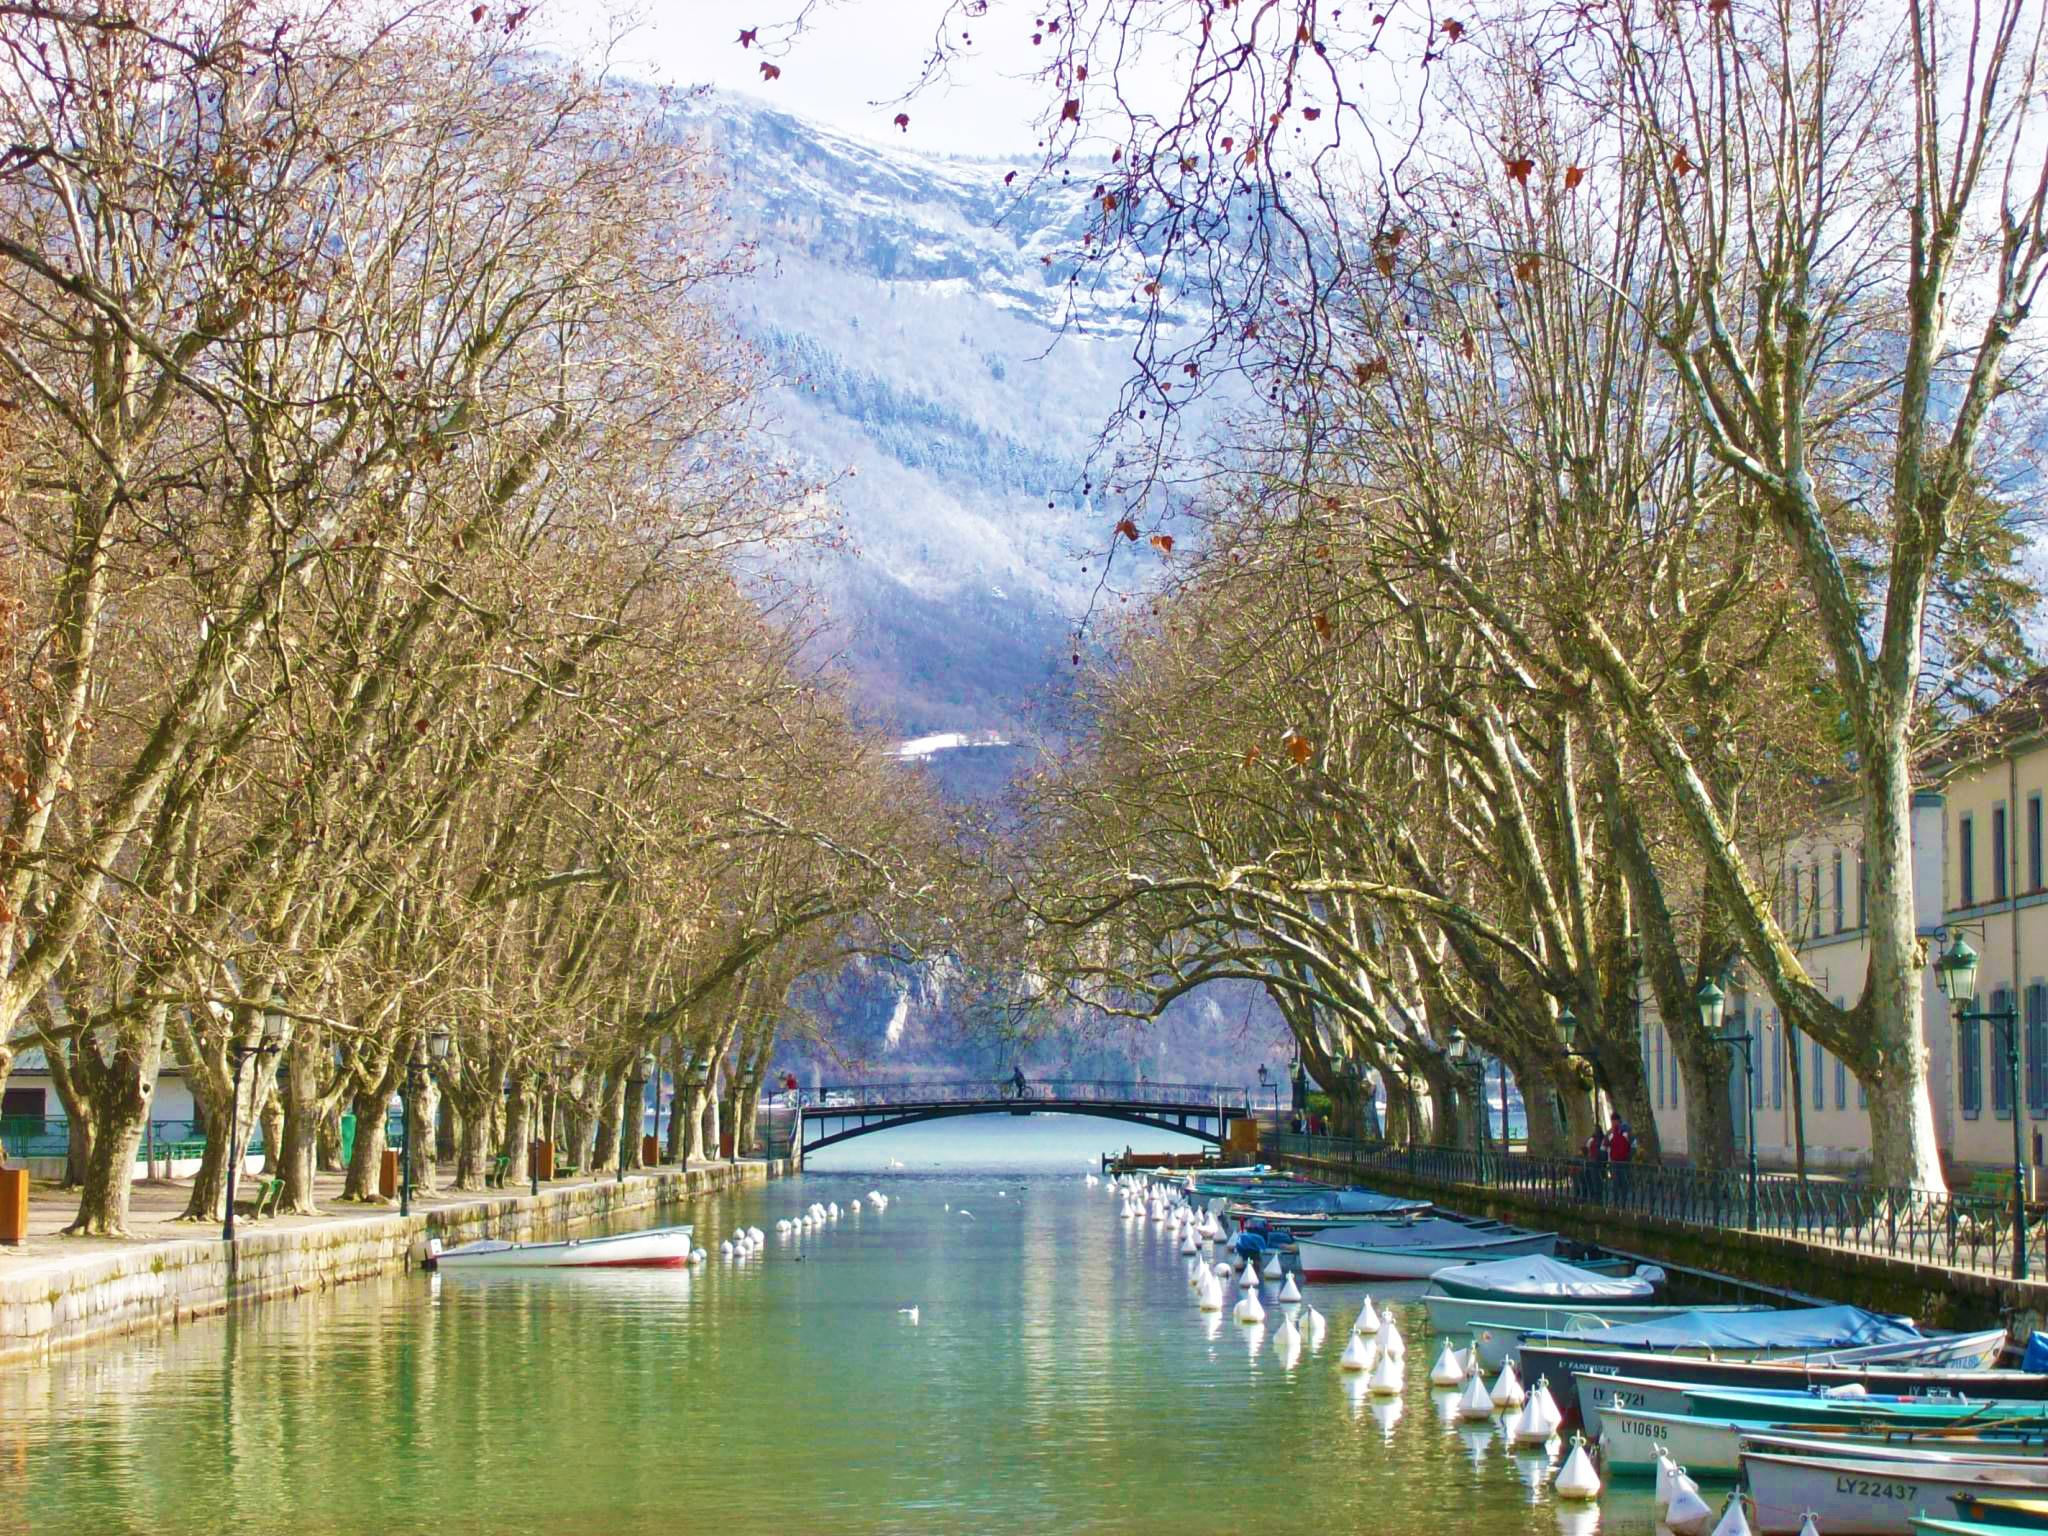 kt_2020_370_Keytours_excursions_Swisstours_annecy_pont_des_amours1_2048_10